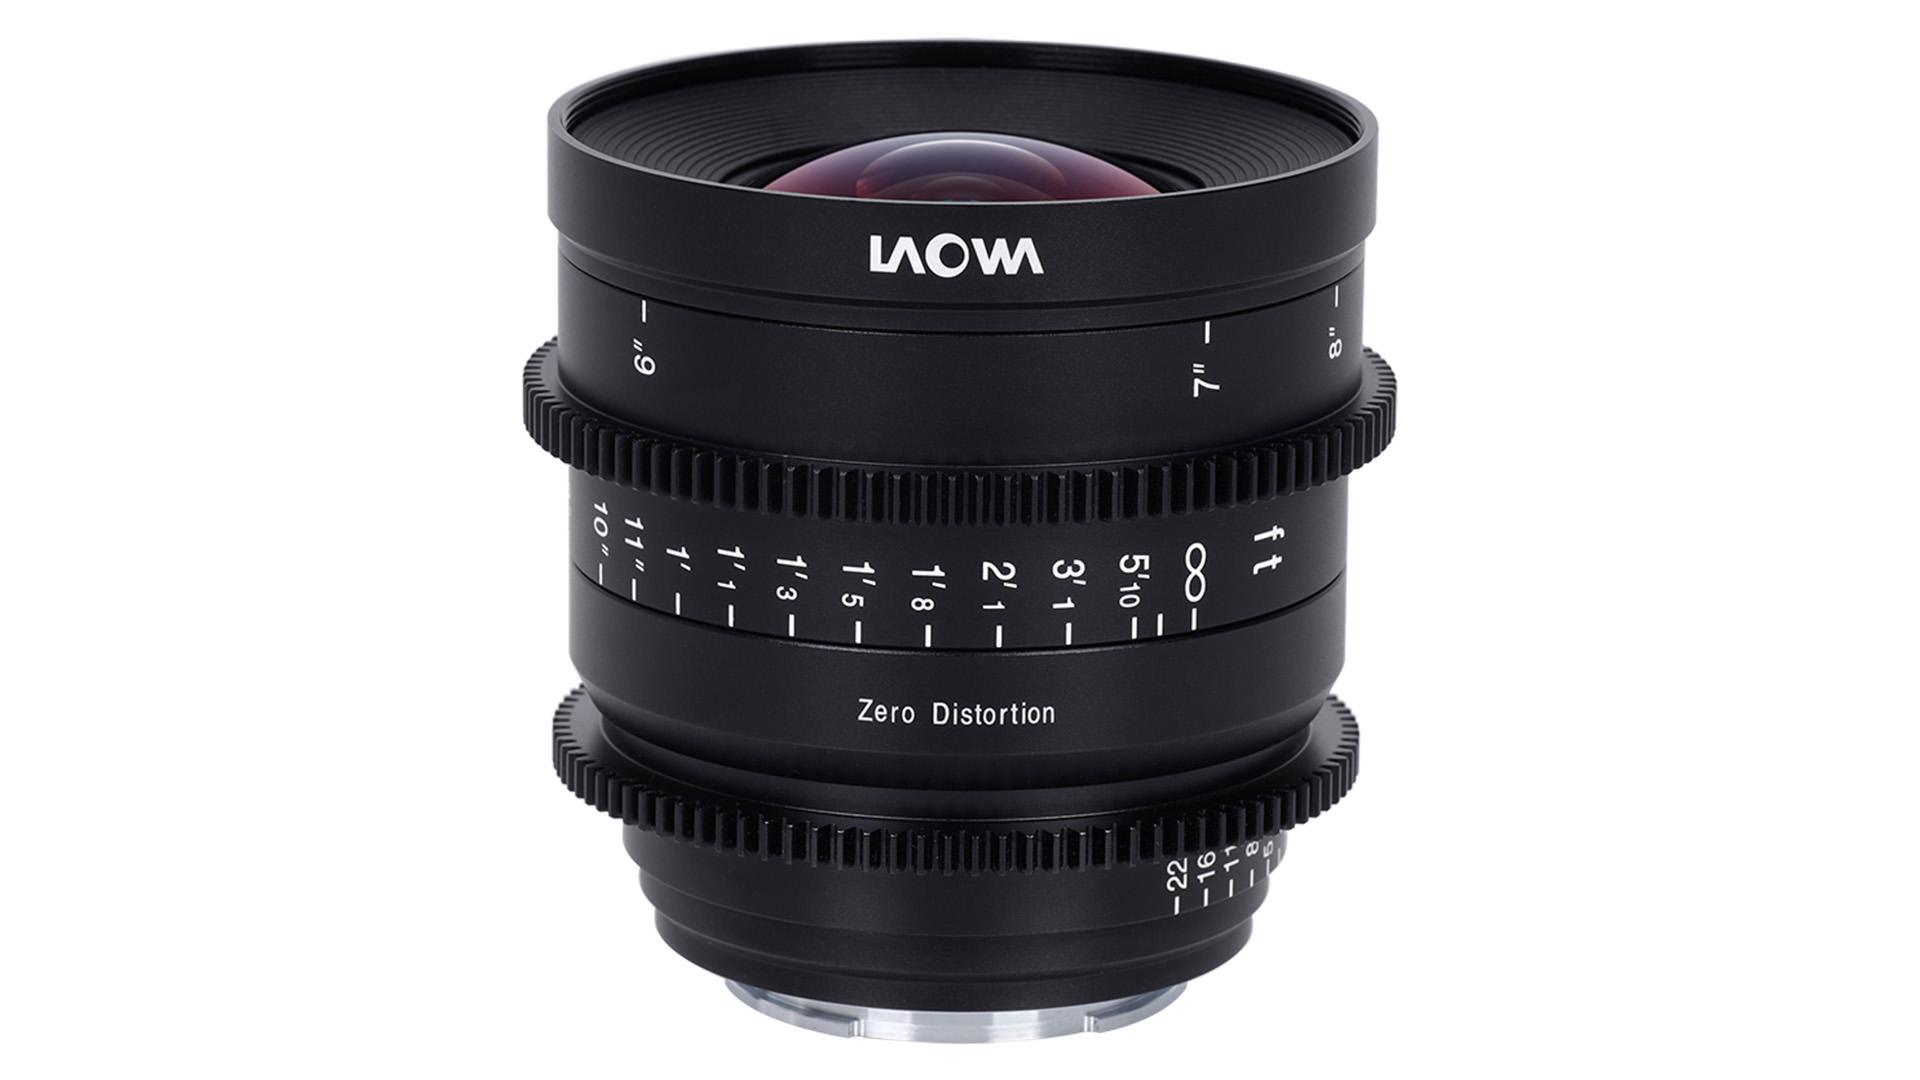 Laowa 15mm t/2.1 ZERO-D